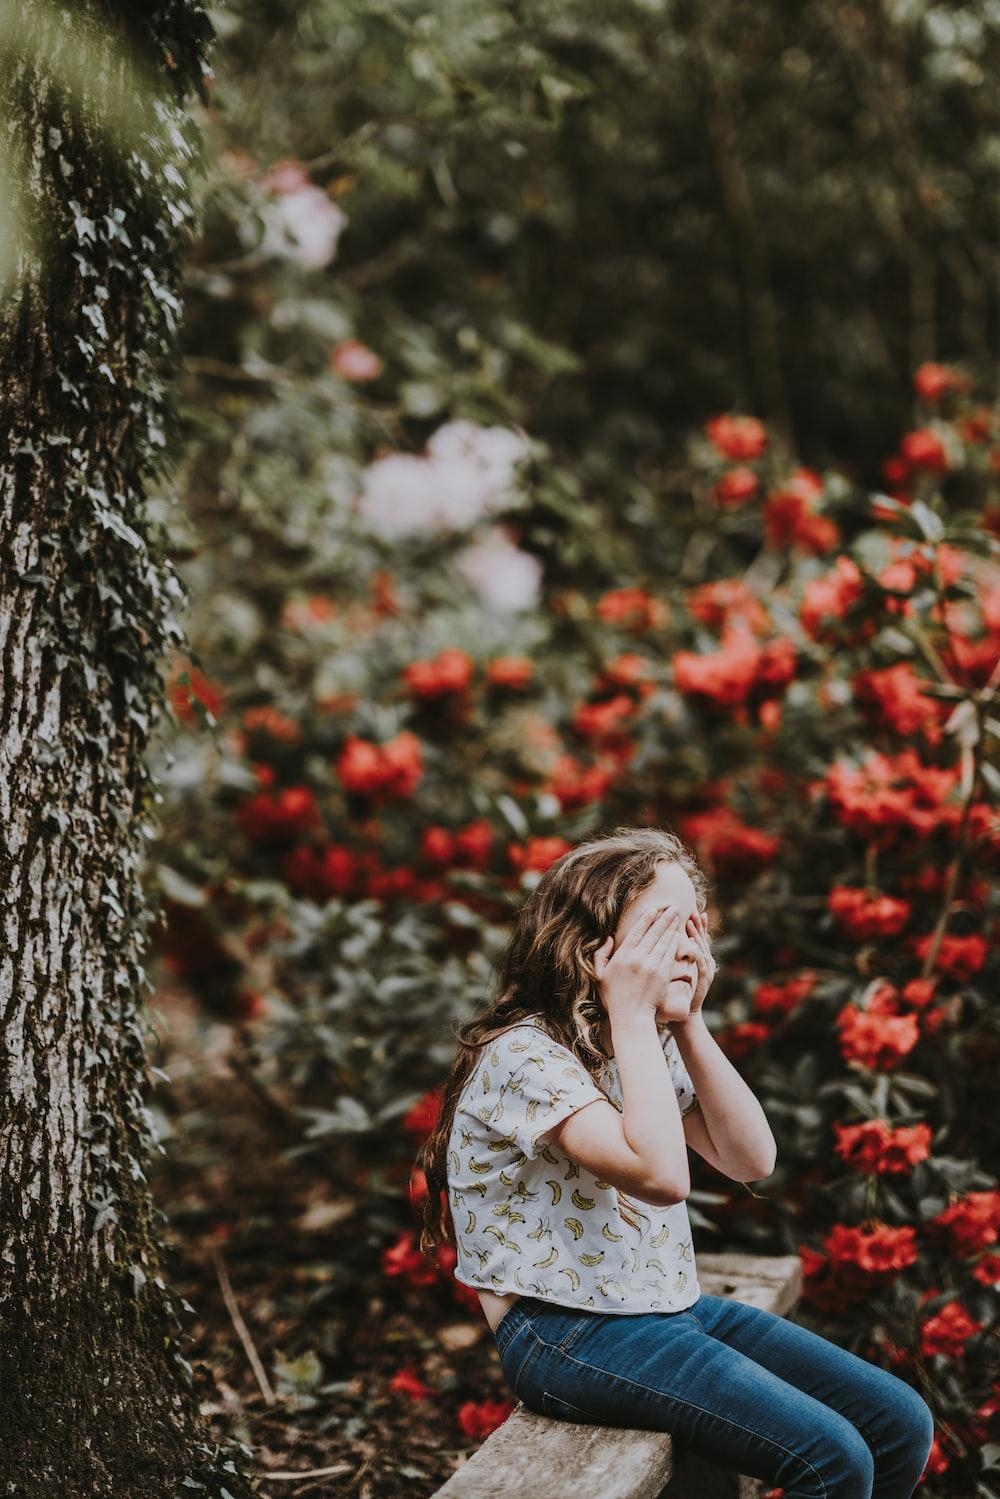 girl sitting on wooden bench near flowers